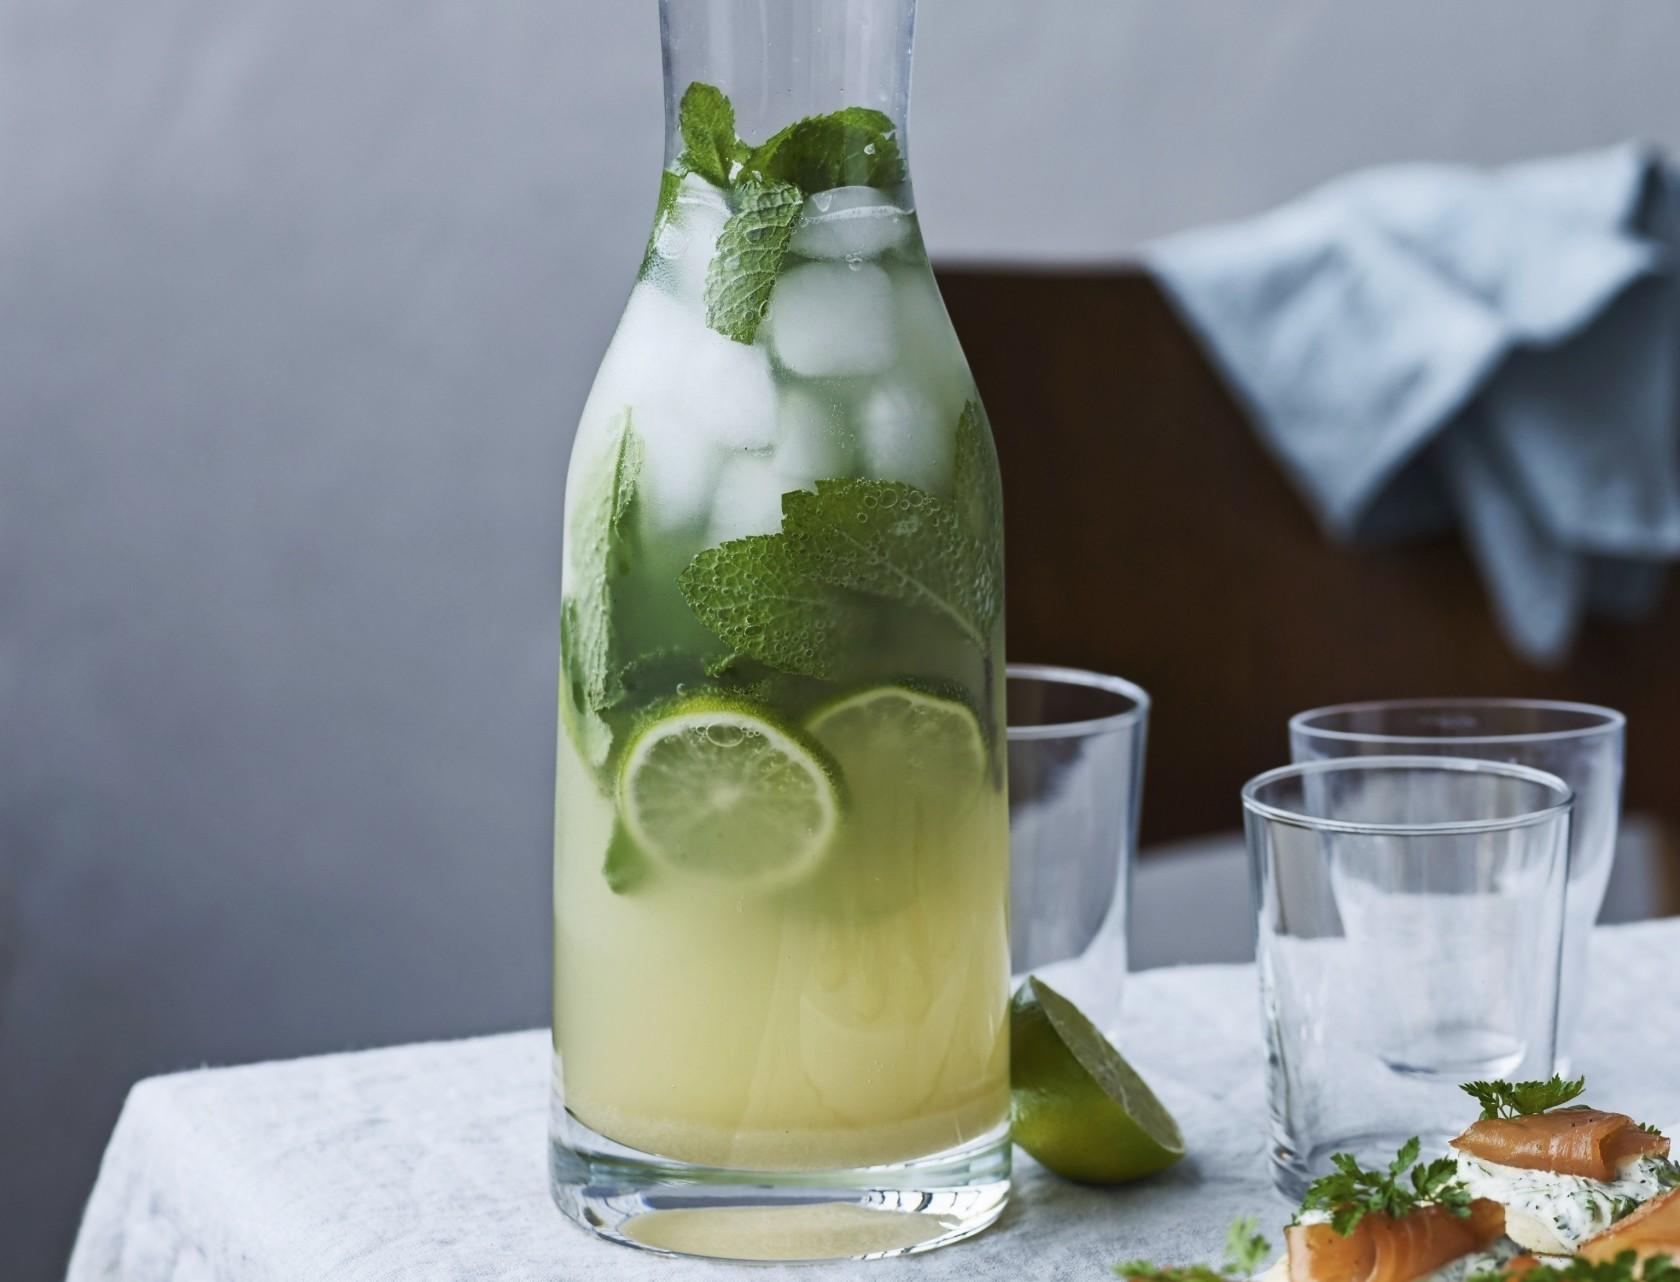 Den lækrste lemonade med lime, ingefær og mynte